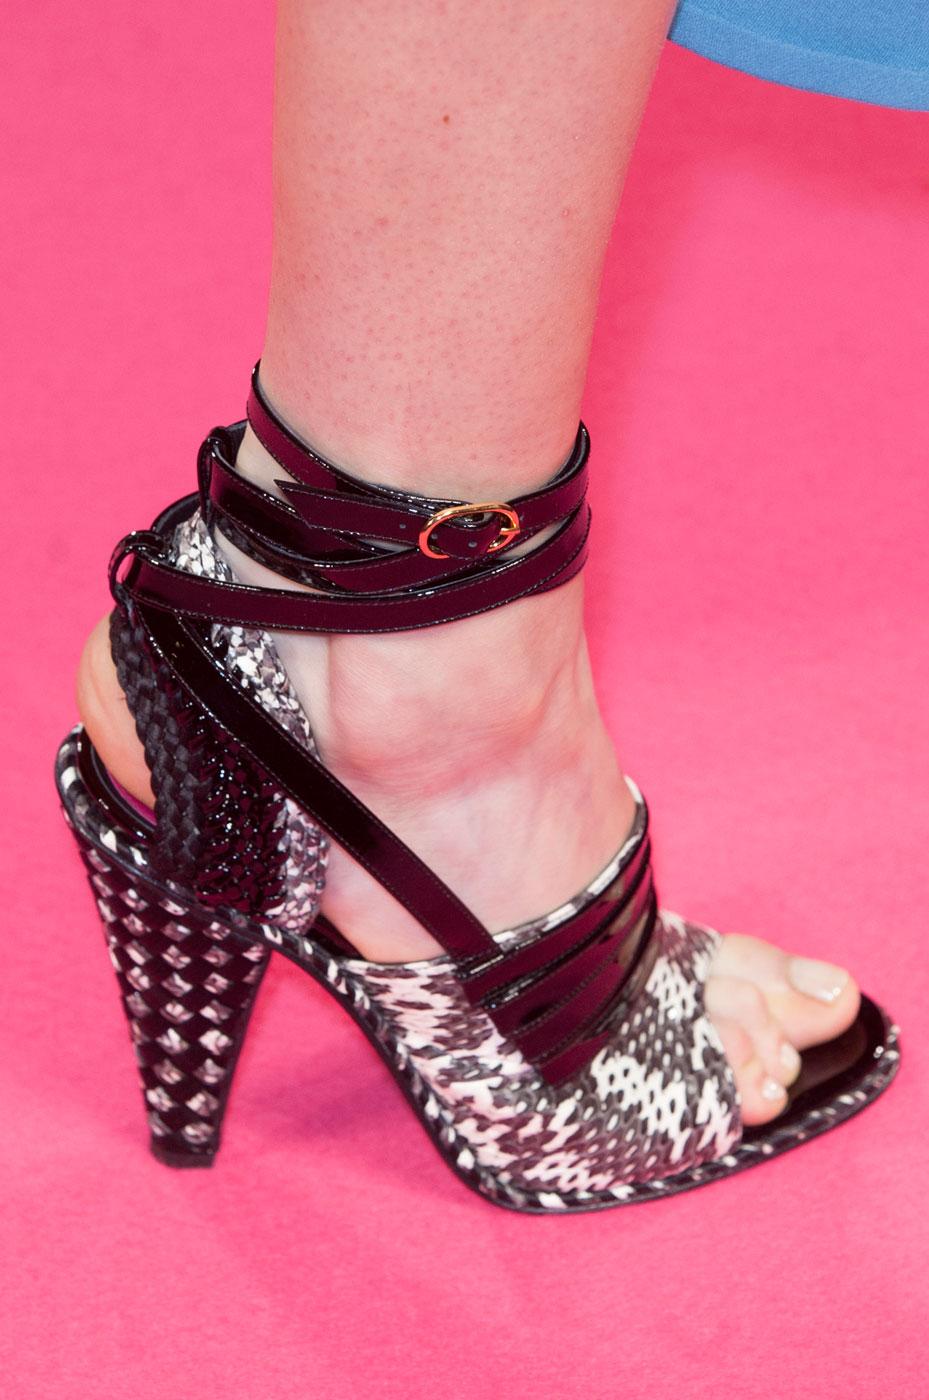 Schiaparelli-fashion-runway-show-close-ups-haute-couture-paris-spring-summer-2015-the-impression-17